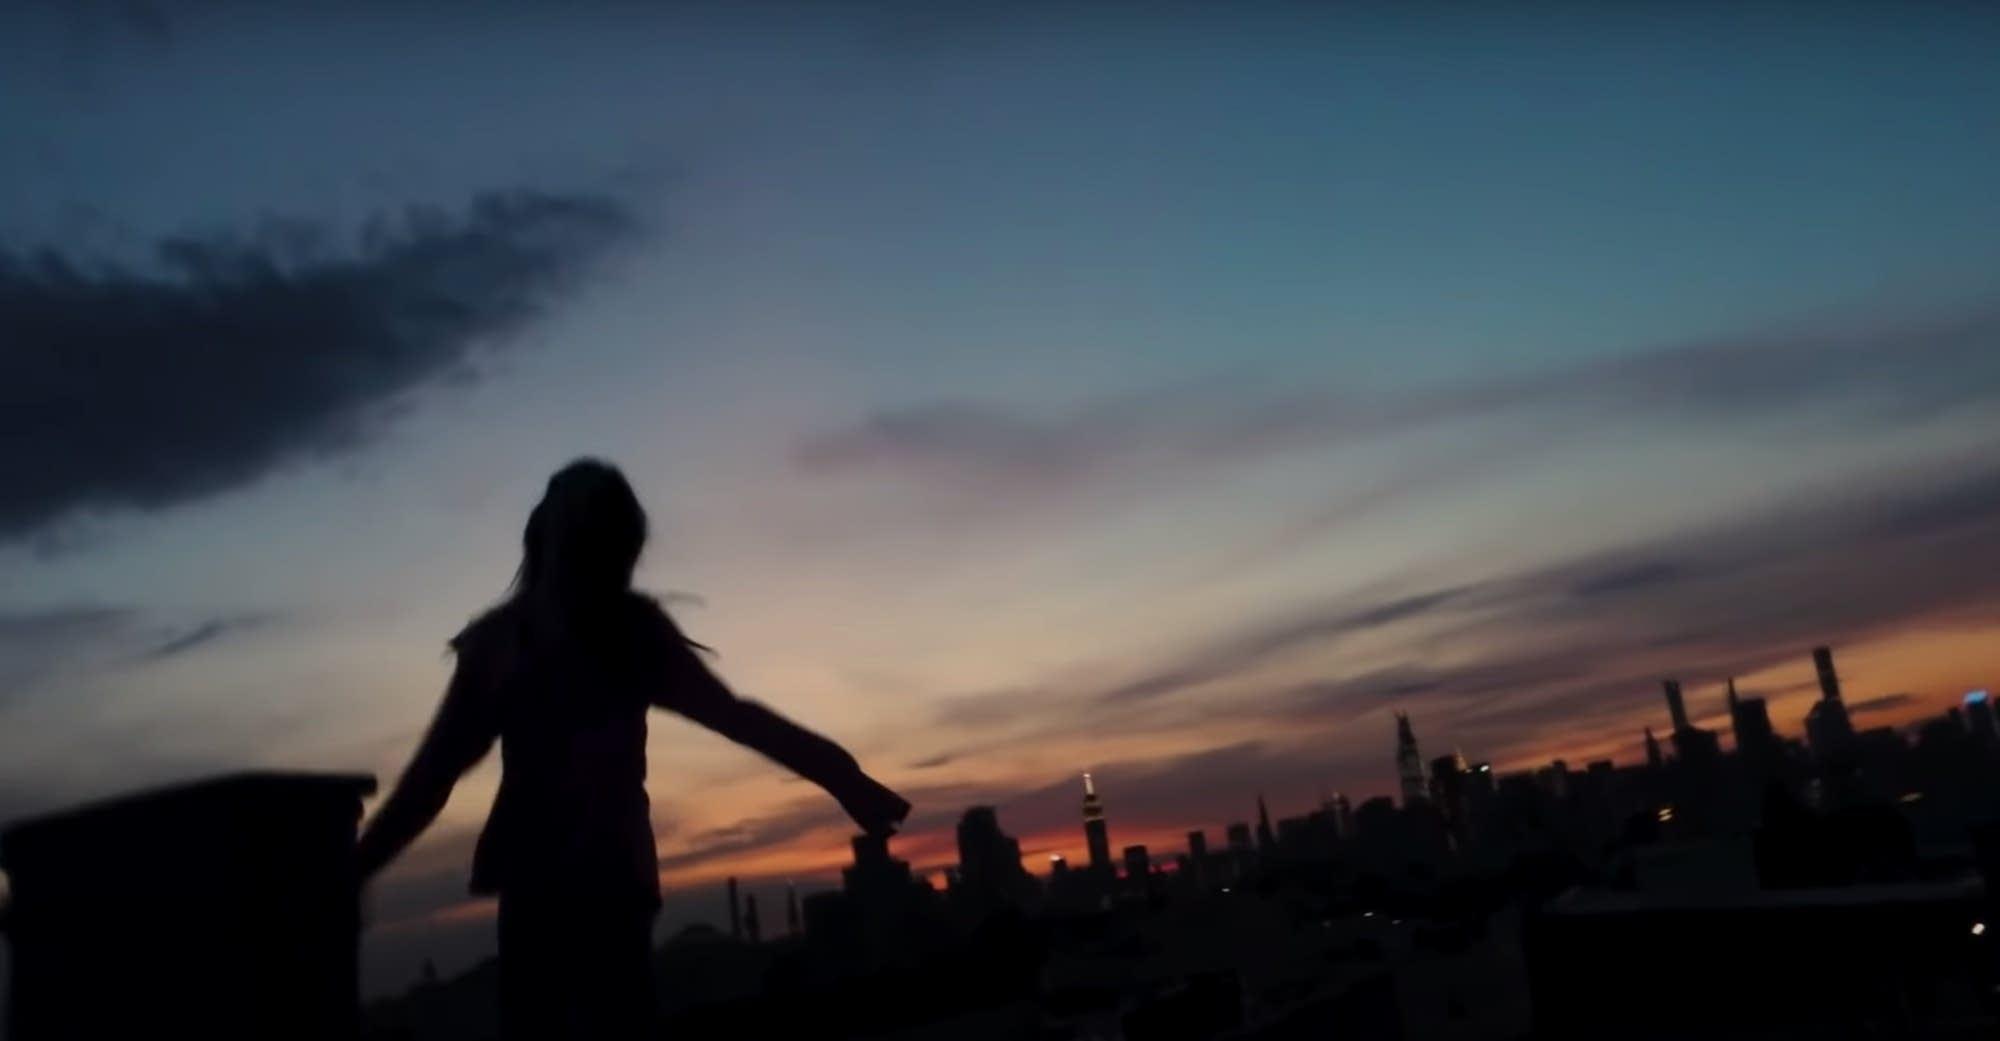 Still from Sylvan Esso's video, 'Rooftop Dancing'